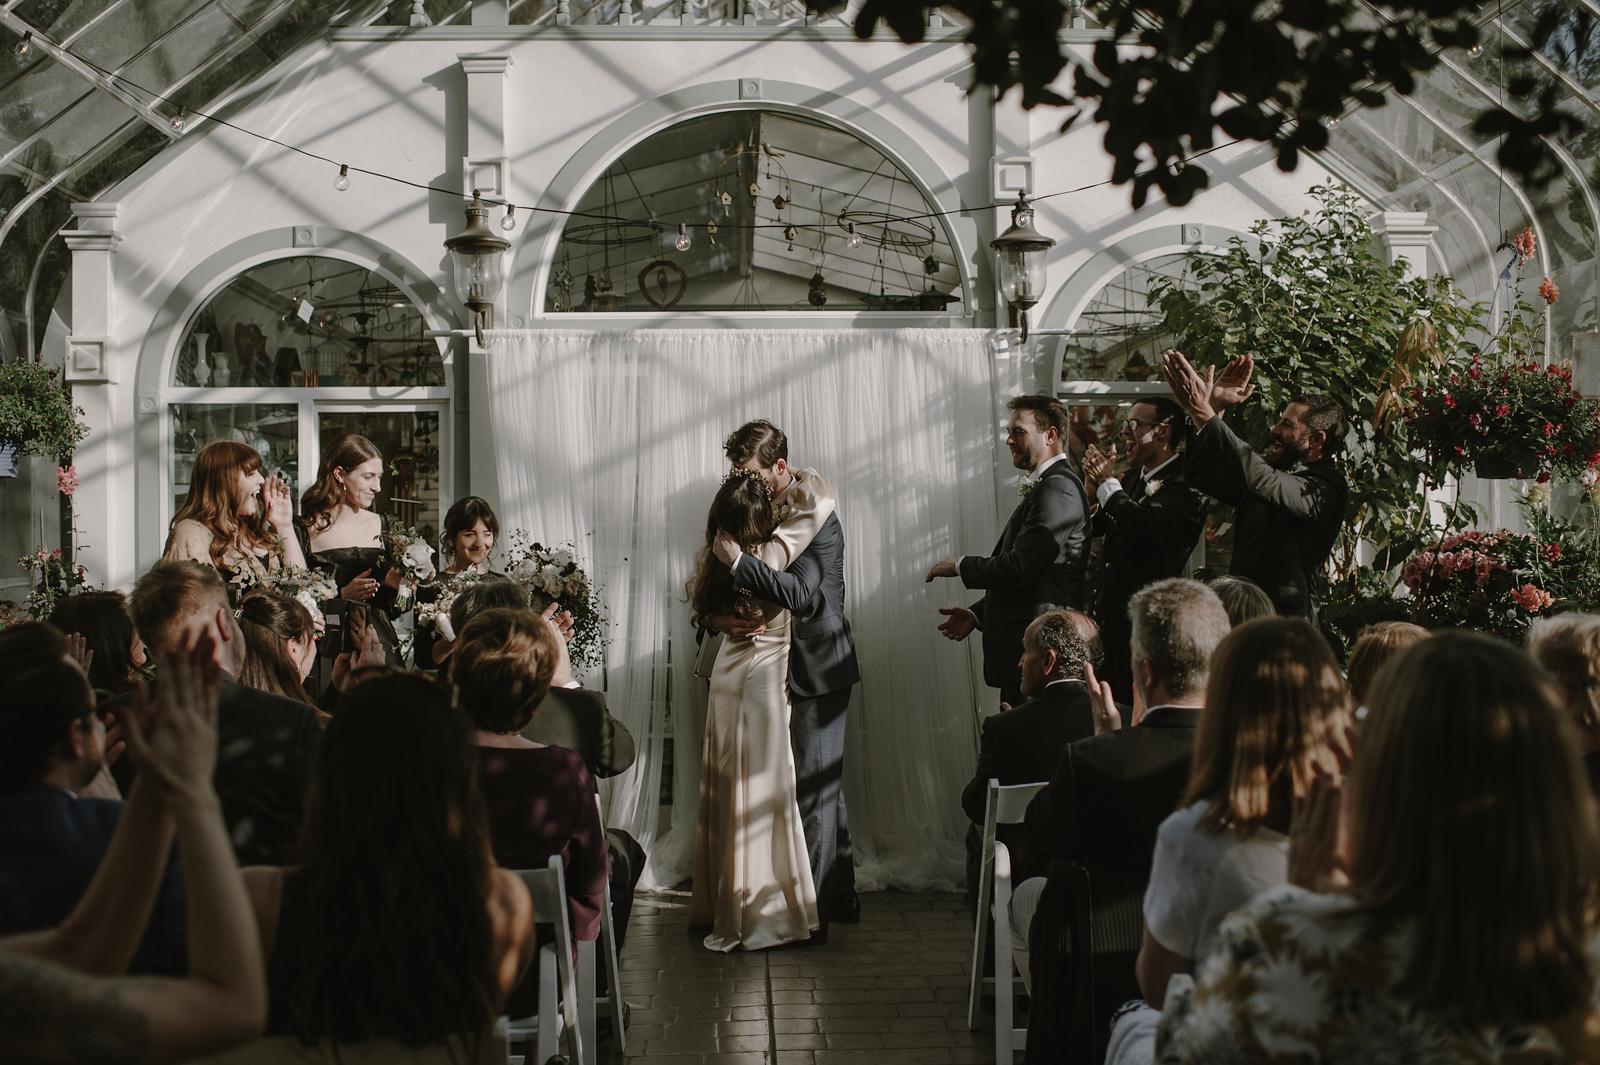 kristenmarieparker_tacoma_conservatory_warehouse_wedding046.JPG